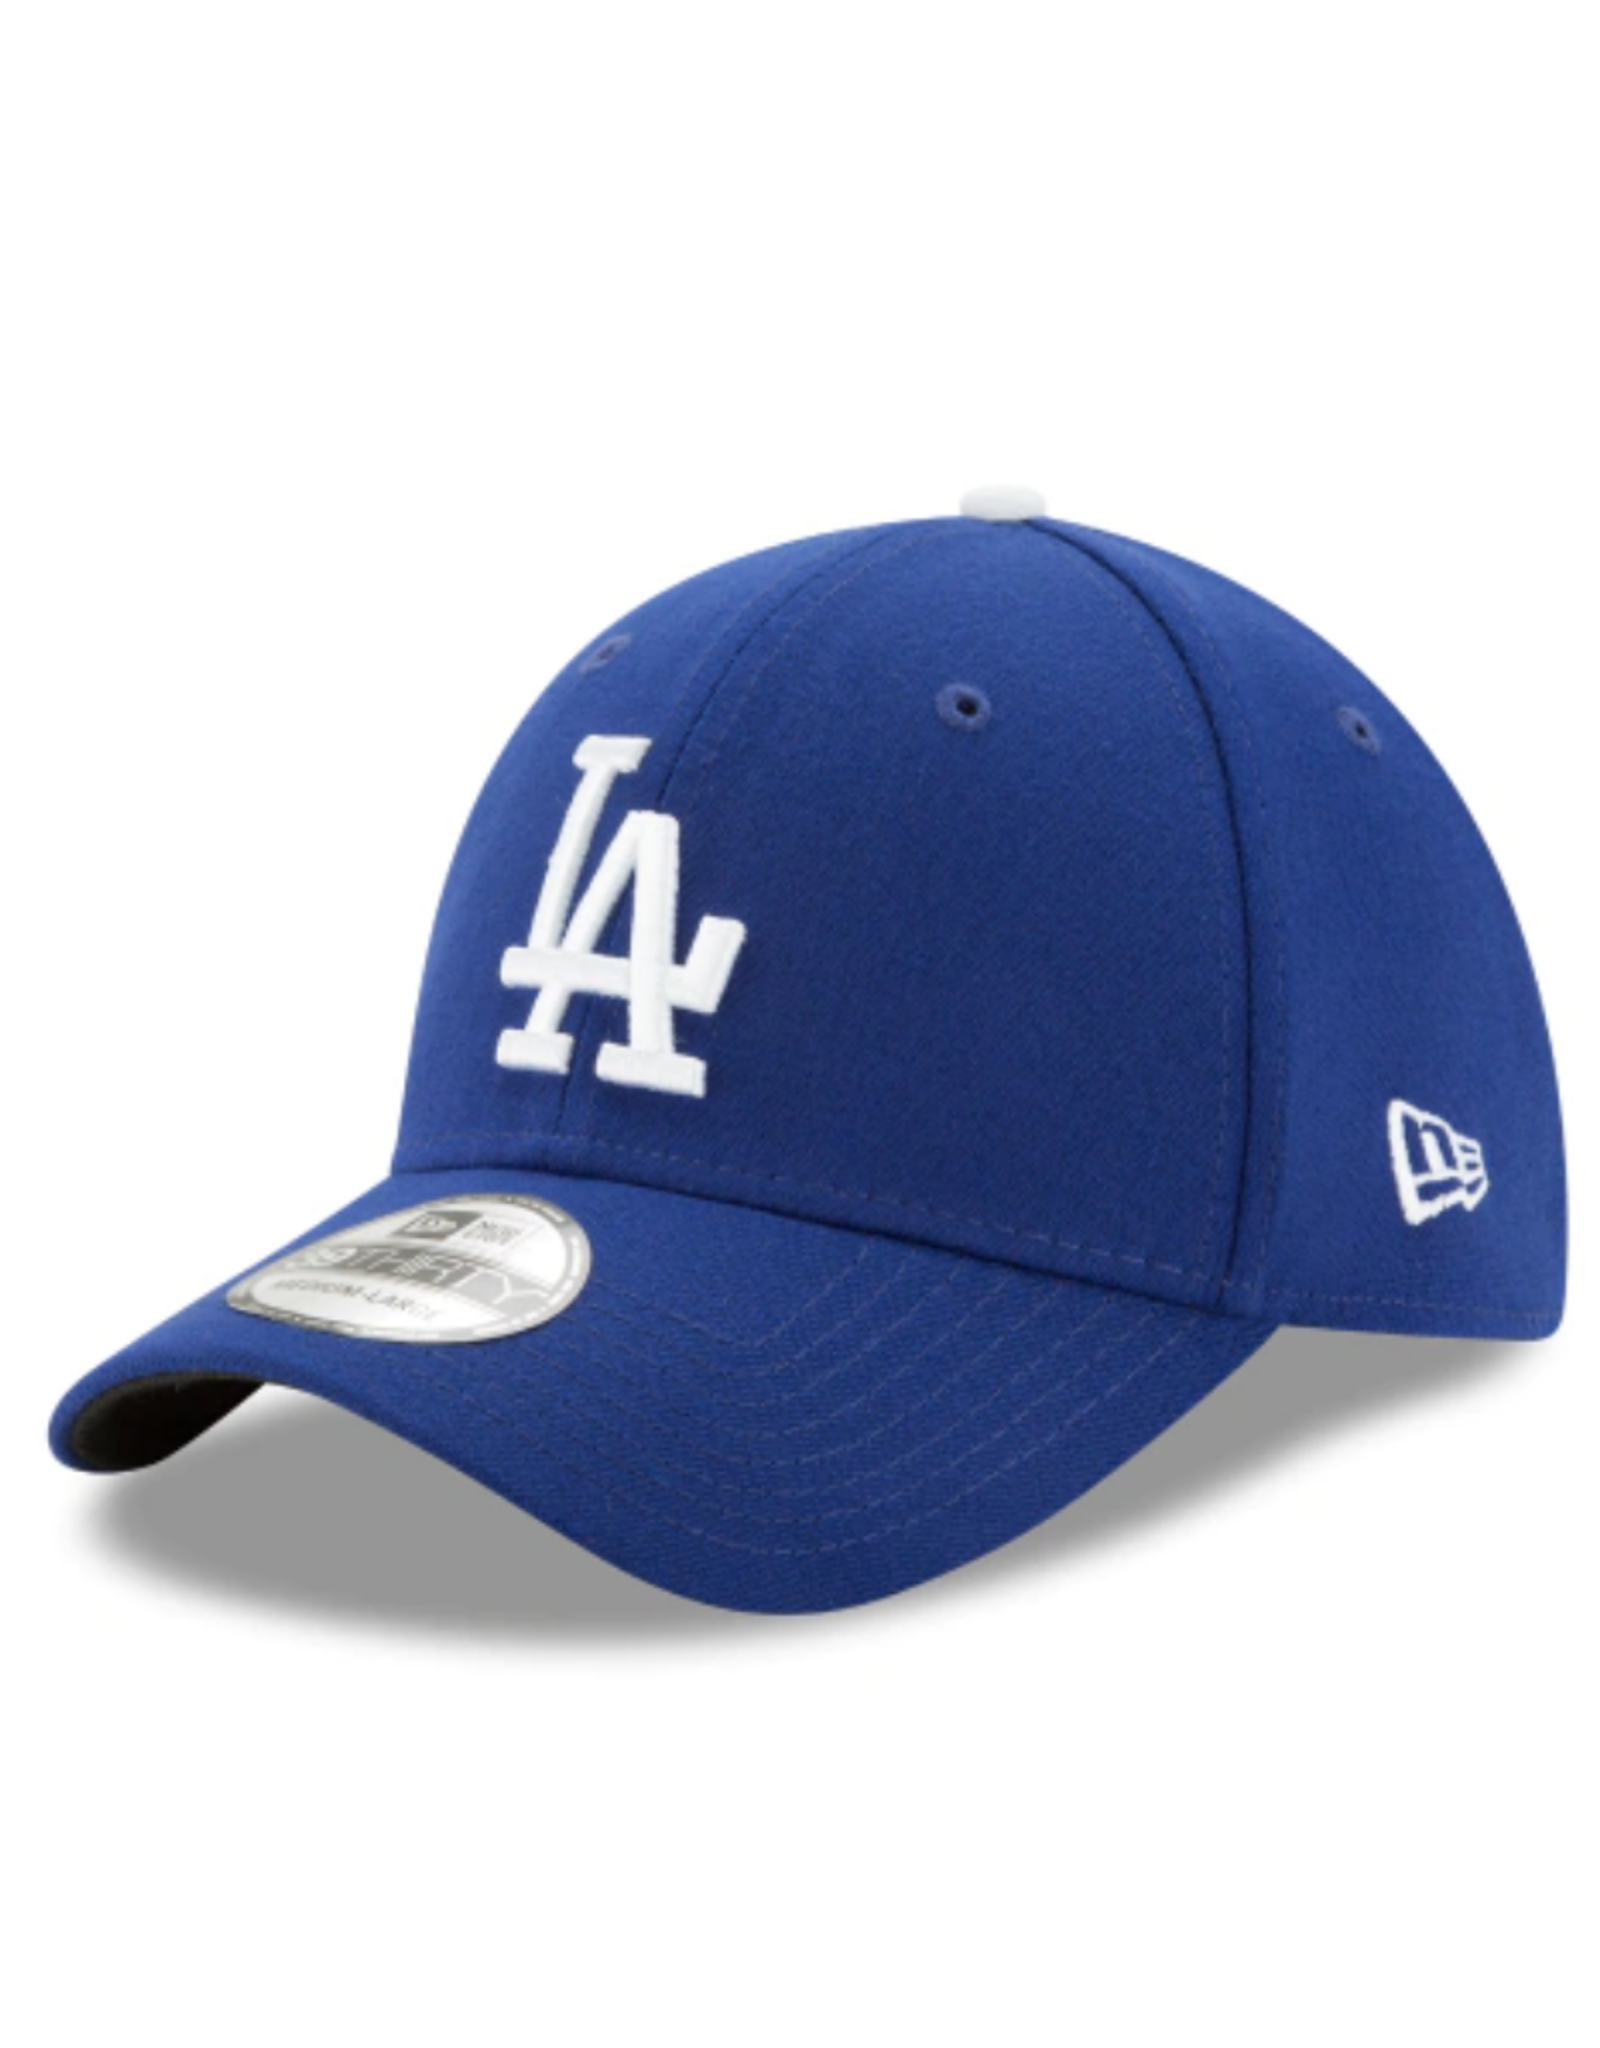 New Era Men's 39THIRTY Classic Stretch Hat Los Angeles Dodgers Royal